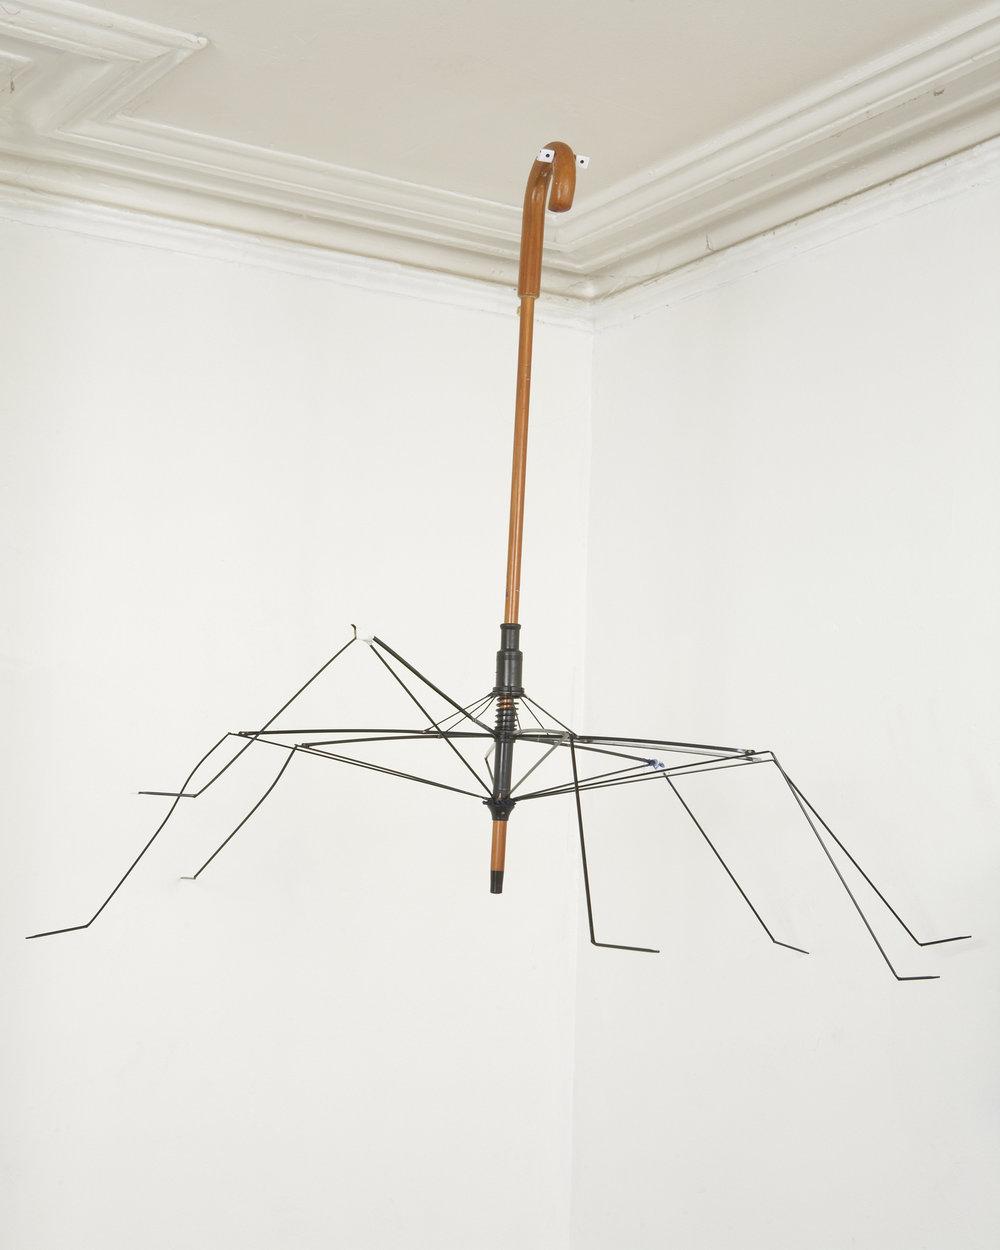 Spider Chigwell.jpg